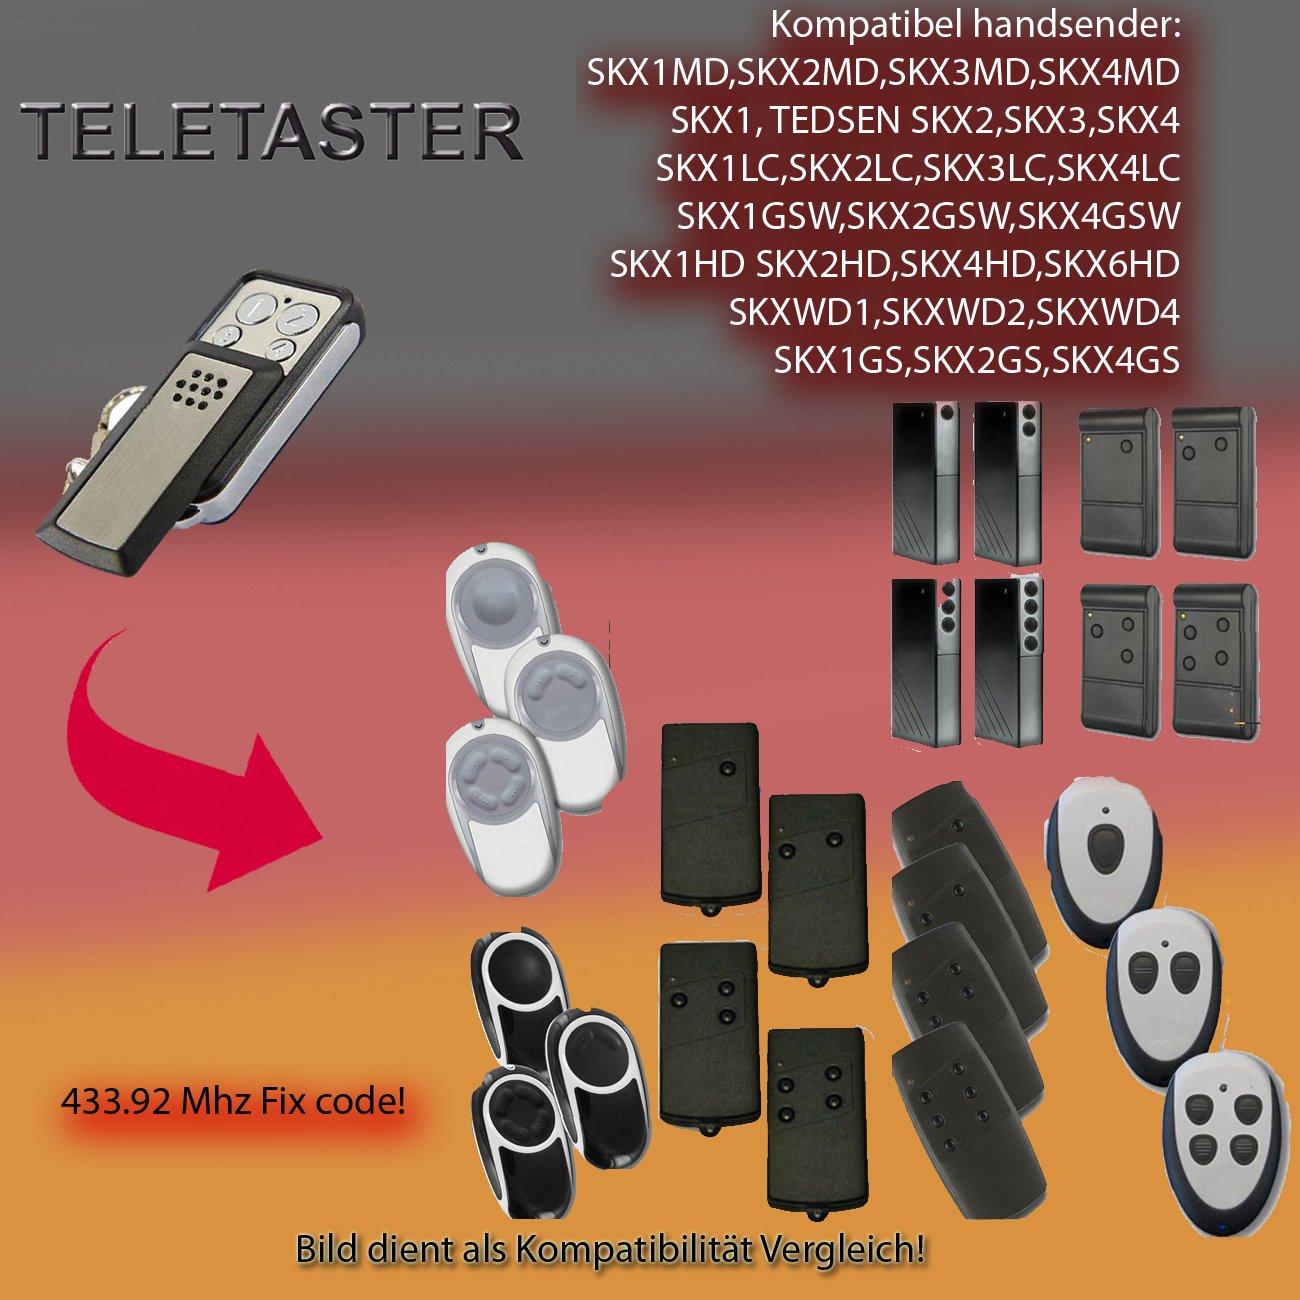 SKX1LC SKX3LC SKX2LC SKX4LC Kompatibel Handsender ersatz klone TELETASTER